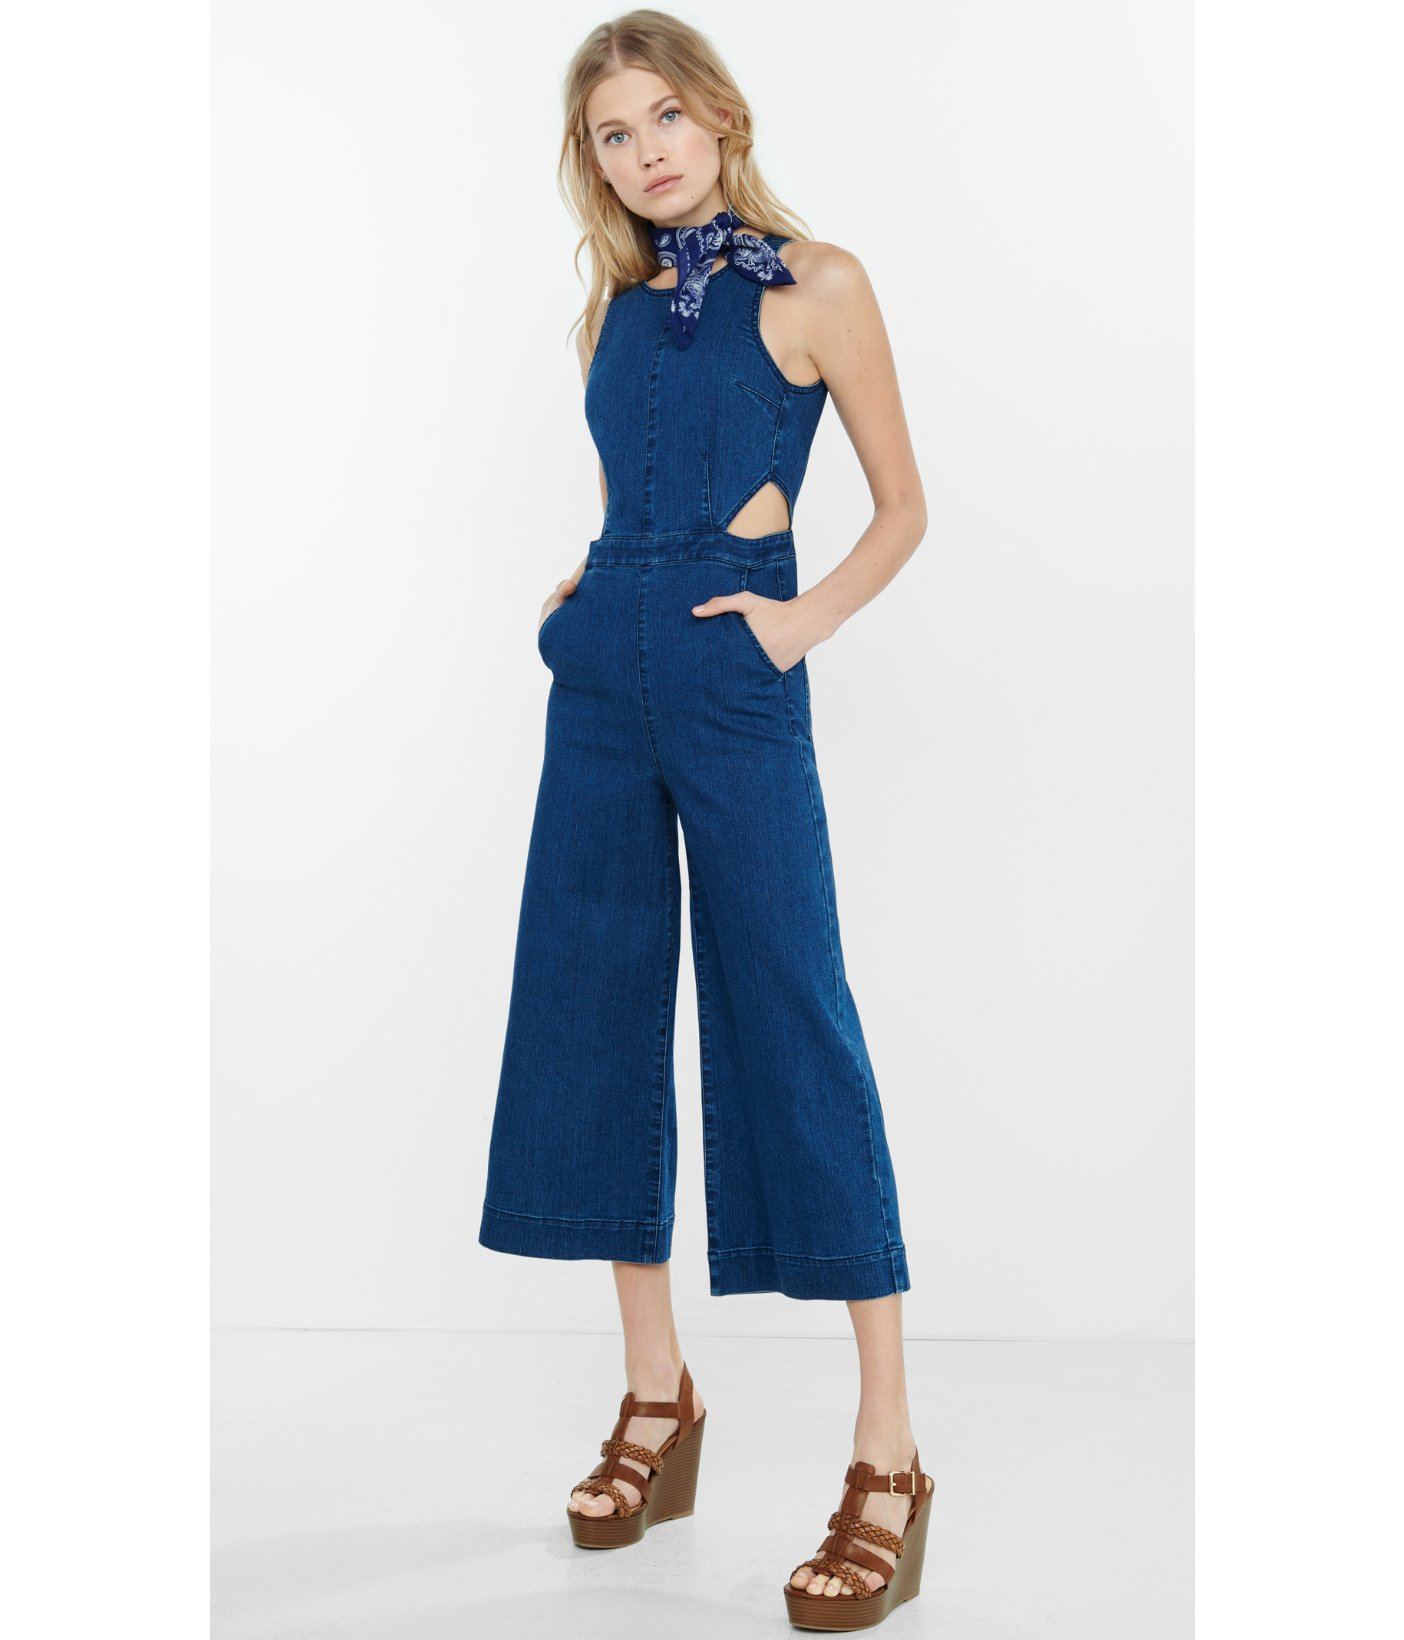 Express Sleeveless Denim Cut Out Culotte Jumpsuit In Blue